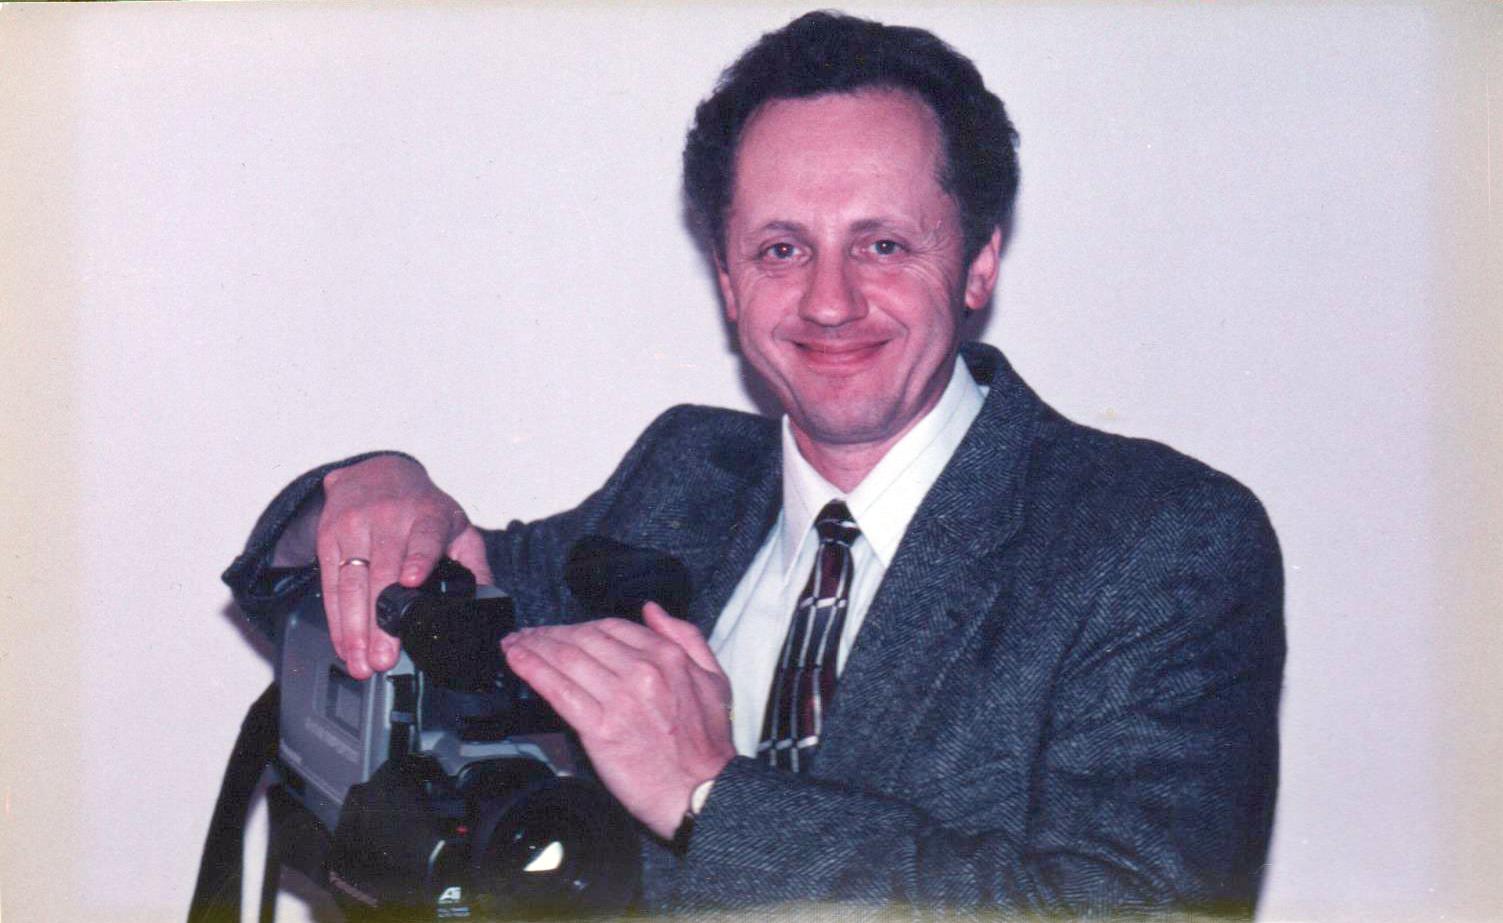 igor yevelev with panasonic camcorder